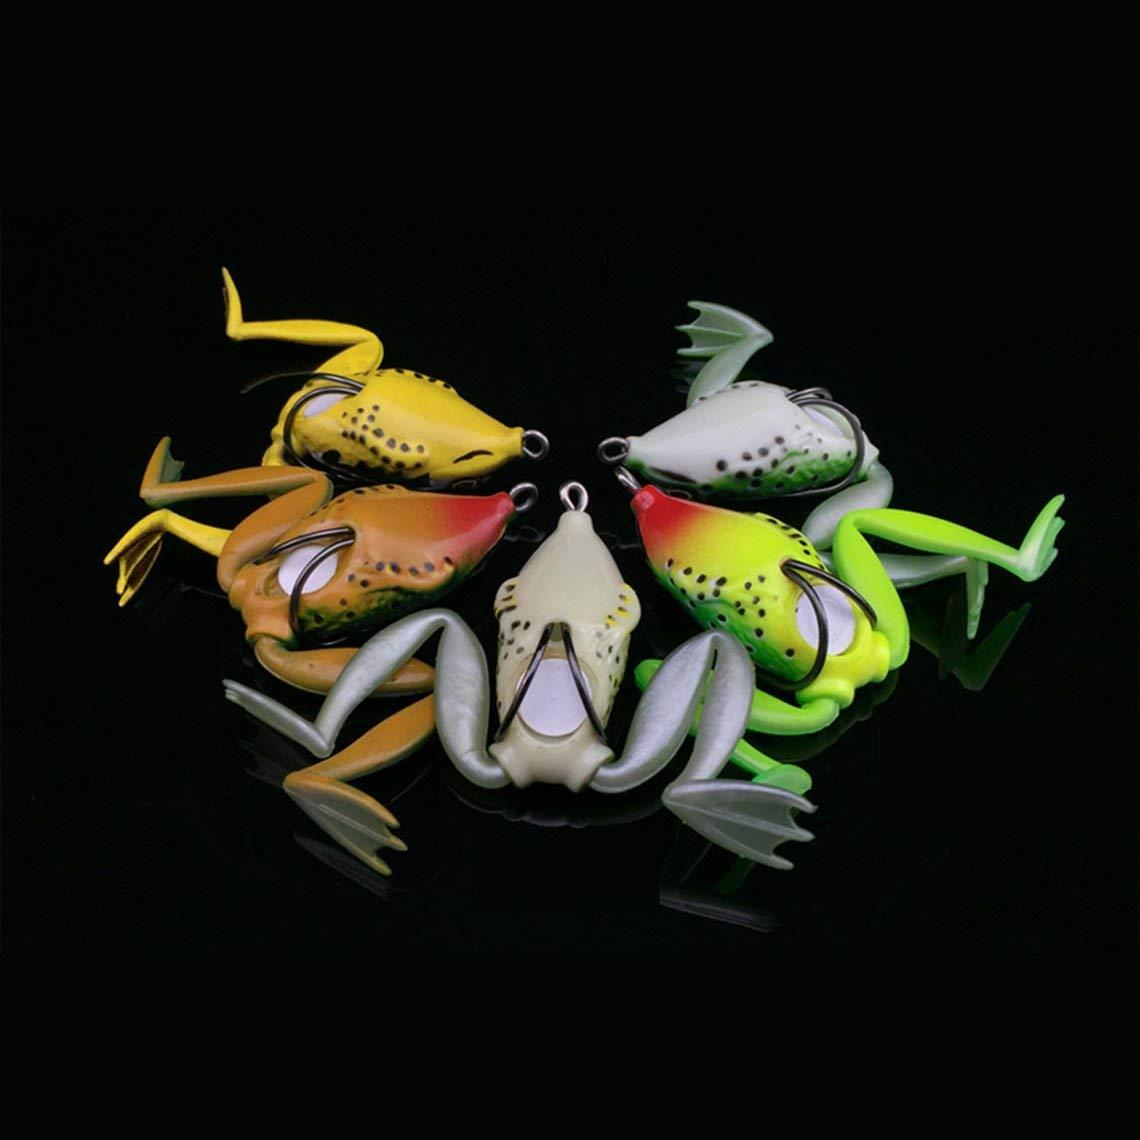 Zinniaya Piccola Dimensione Rana di plastica Lure Snakehead Lure Topwater Simulazione Rana Fishing Lure Soft Bass Bait Fishing Accessories